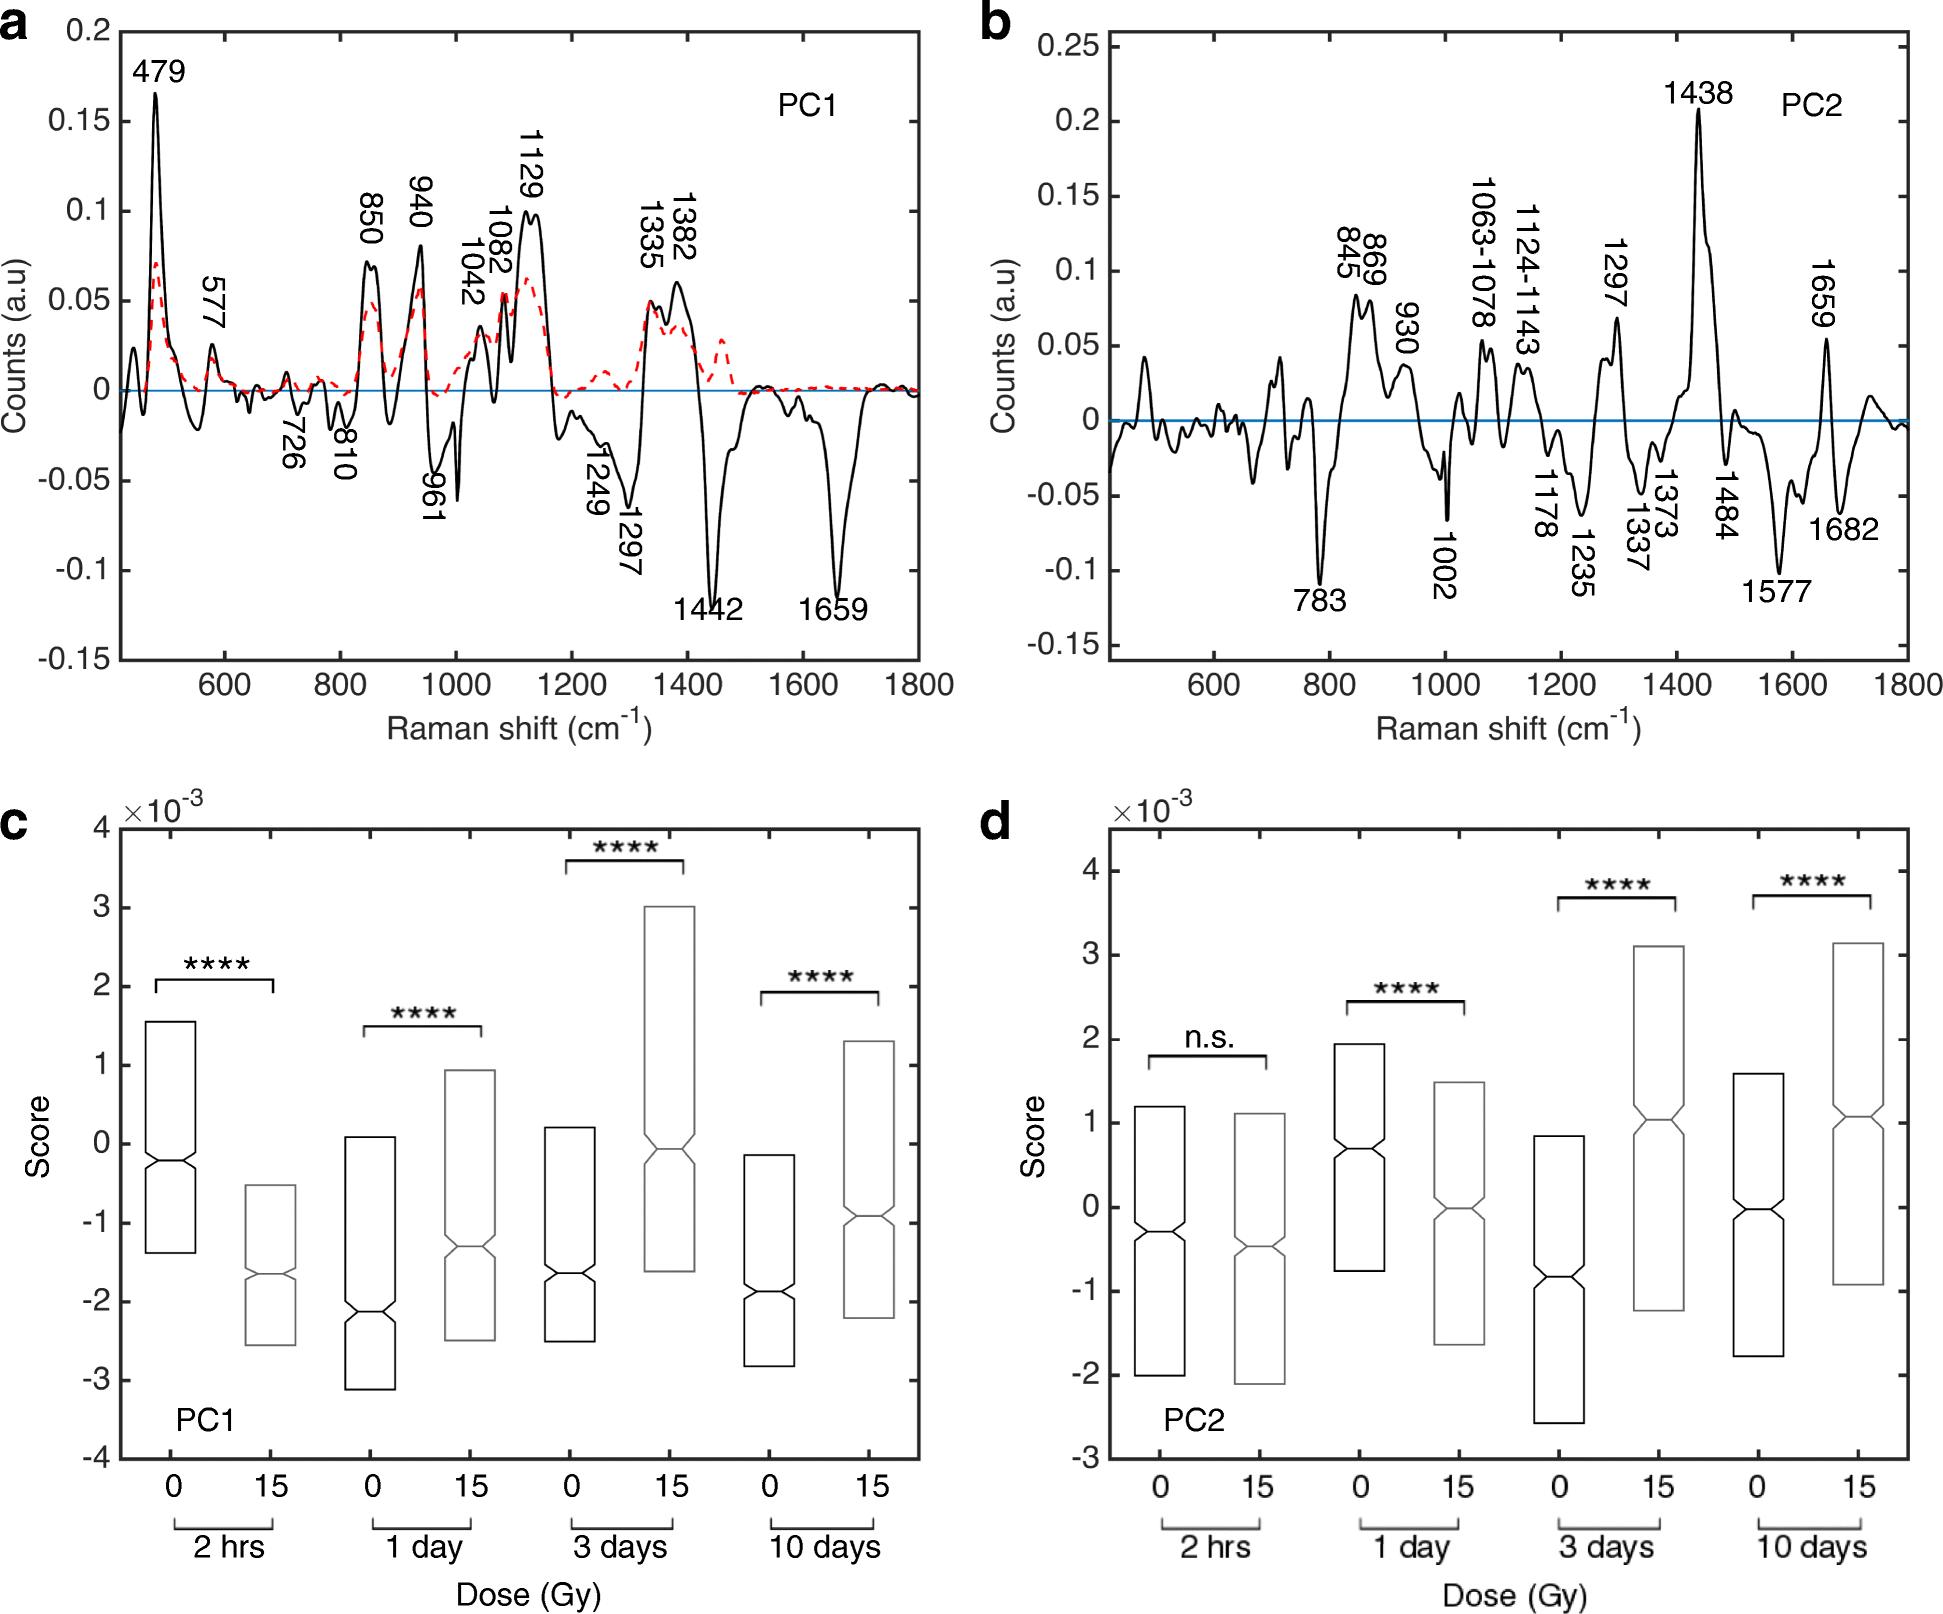 Raman spectroscopy detects metabolic signatures of radiation